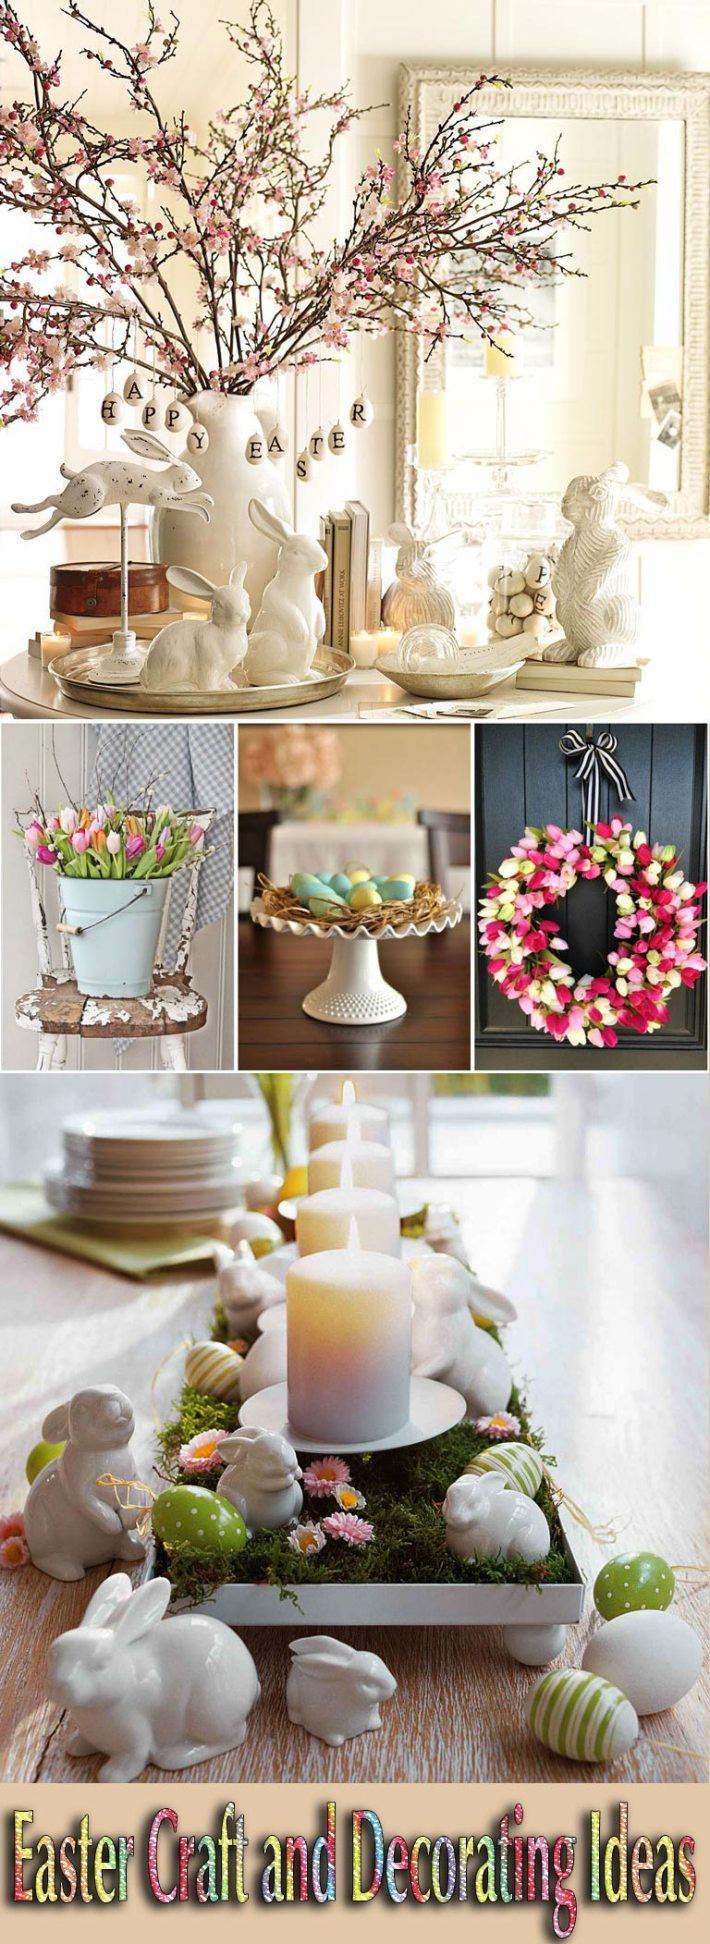 Decorating Tips: Quiet Corner:Easter Craft And Decorating Ideas